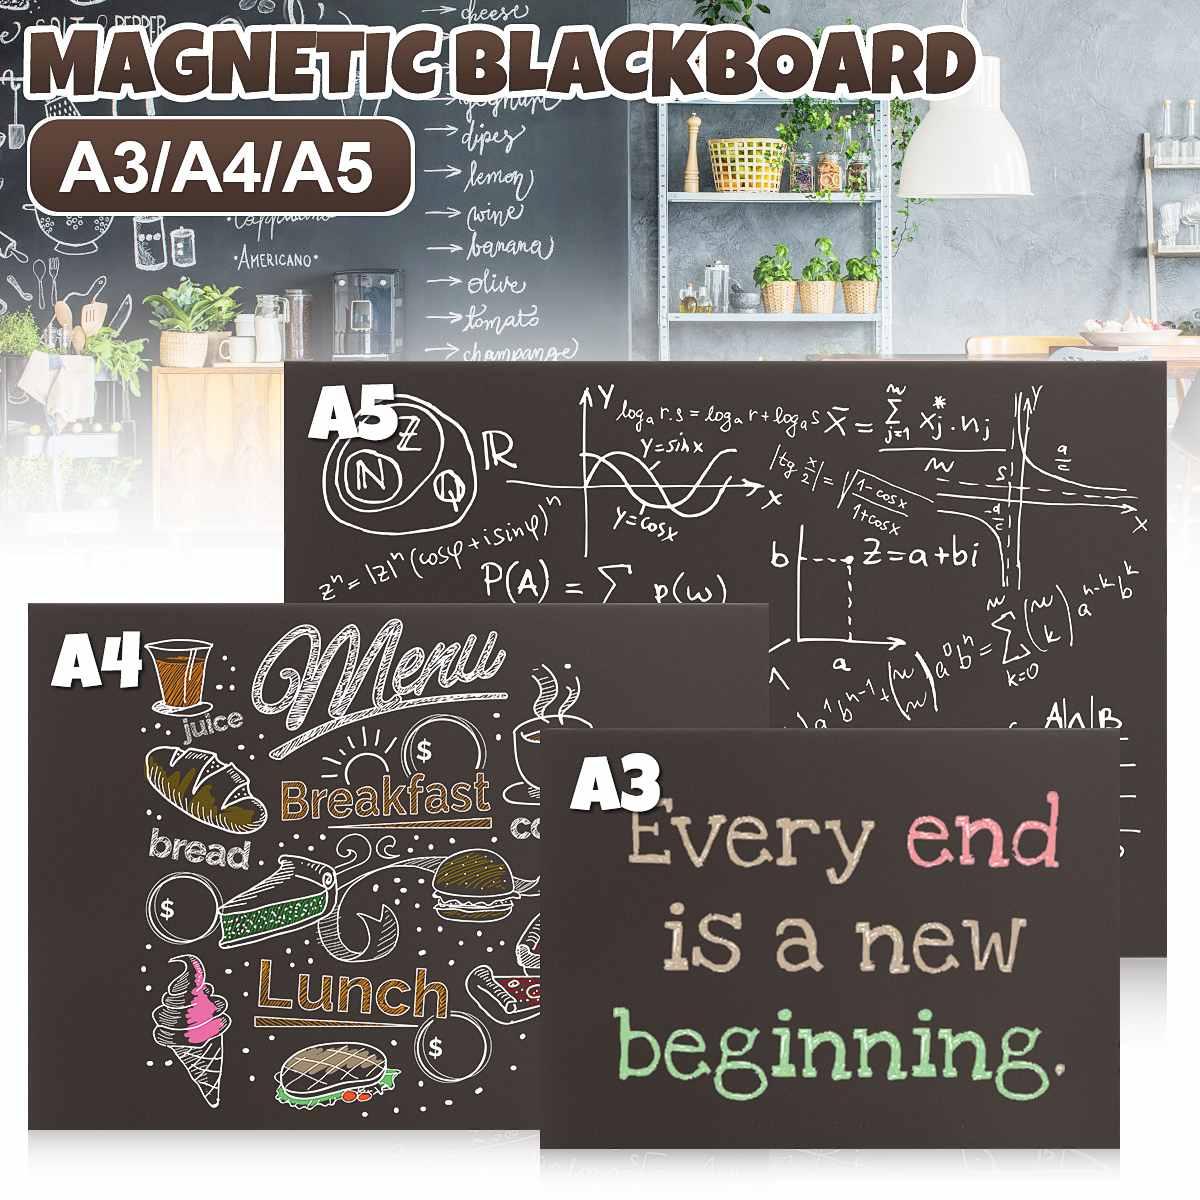 A3 A4 A5 Chalk Board Blackboard Sticker Waterproof Removable Kids Writing Board Art Home Wall Sticker Supplies Decor Accessories